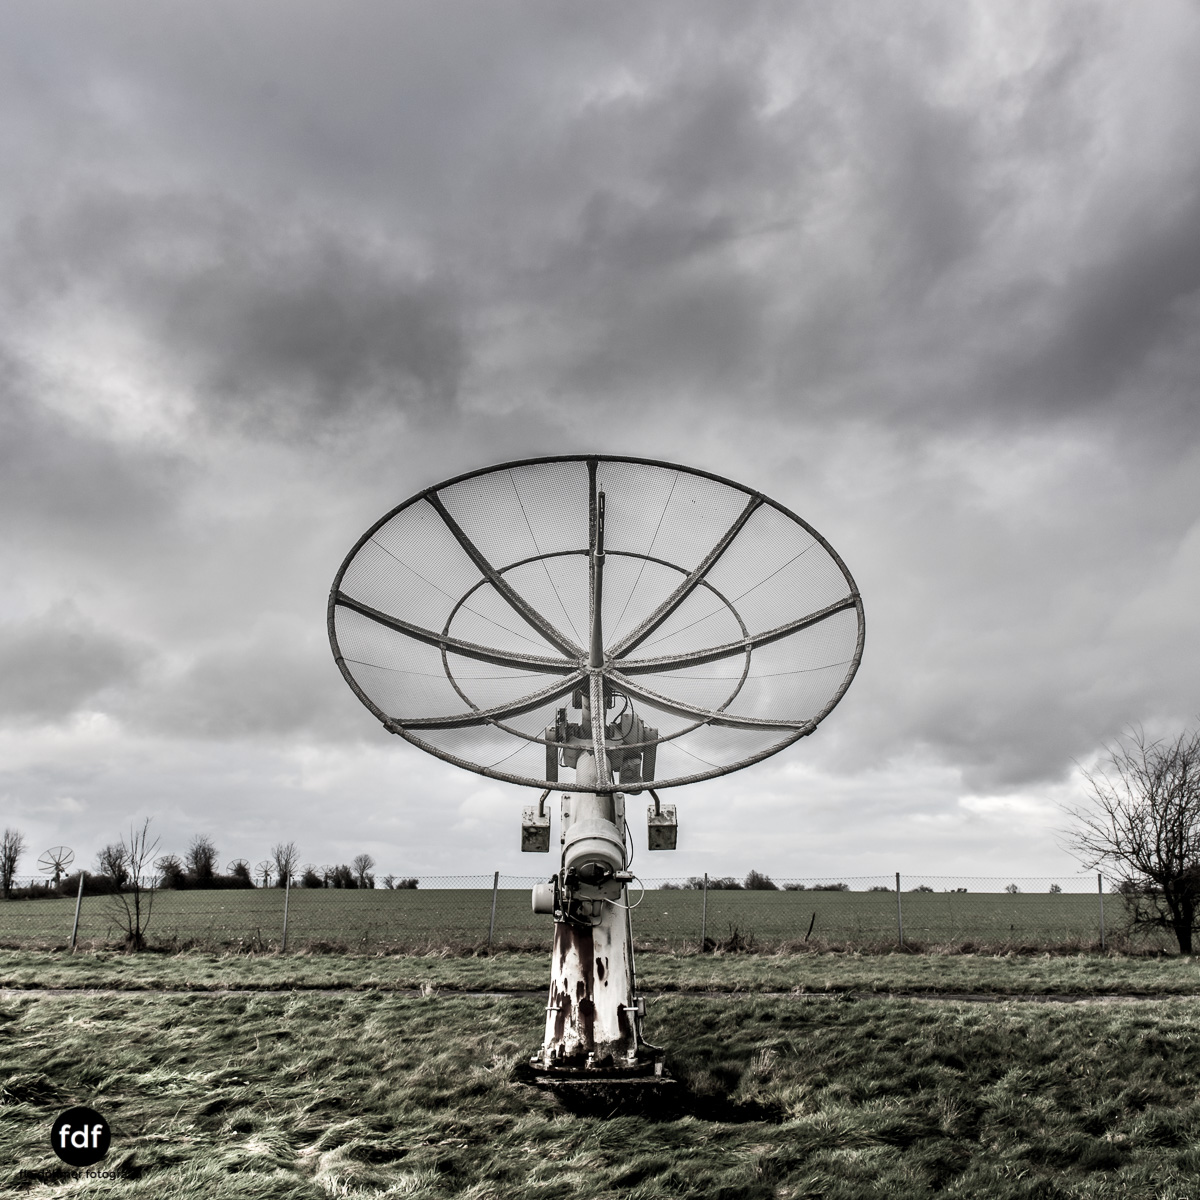 Outer-Space-Radioteleskop-Antennen-Belgien-Urbex-Los-Place-8.jpg